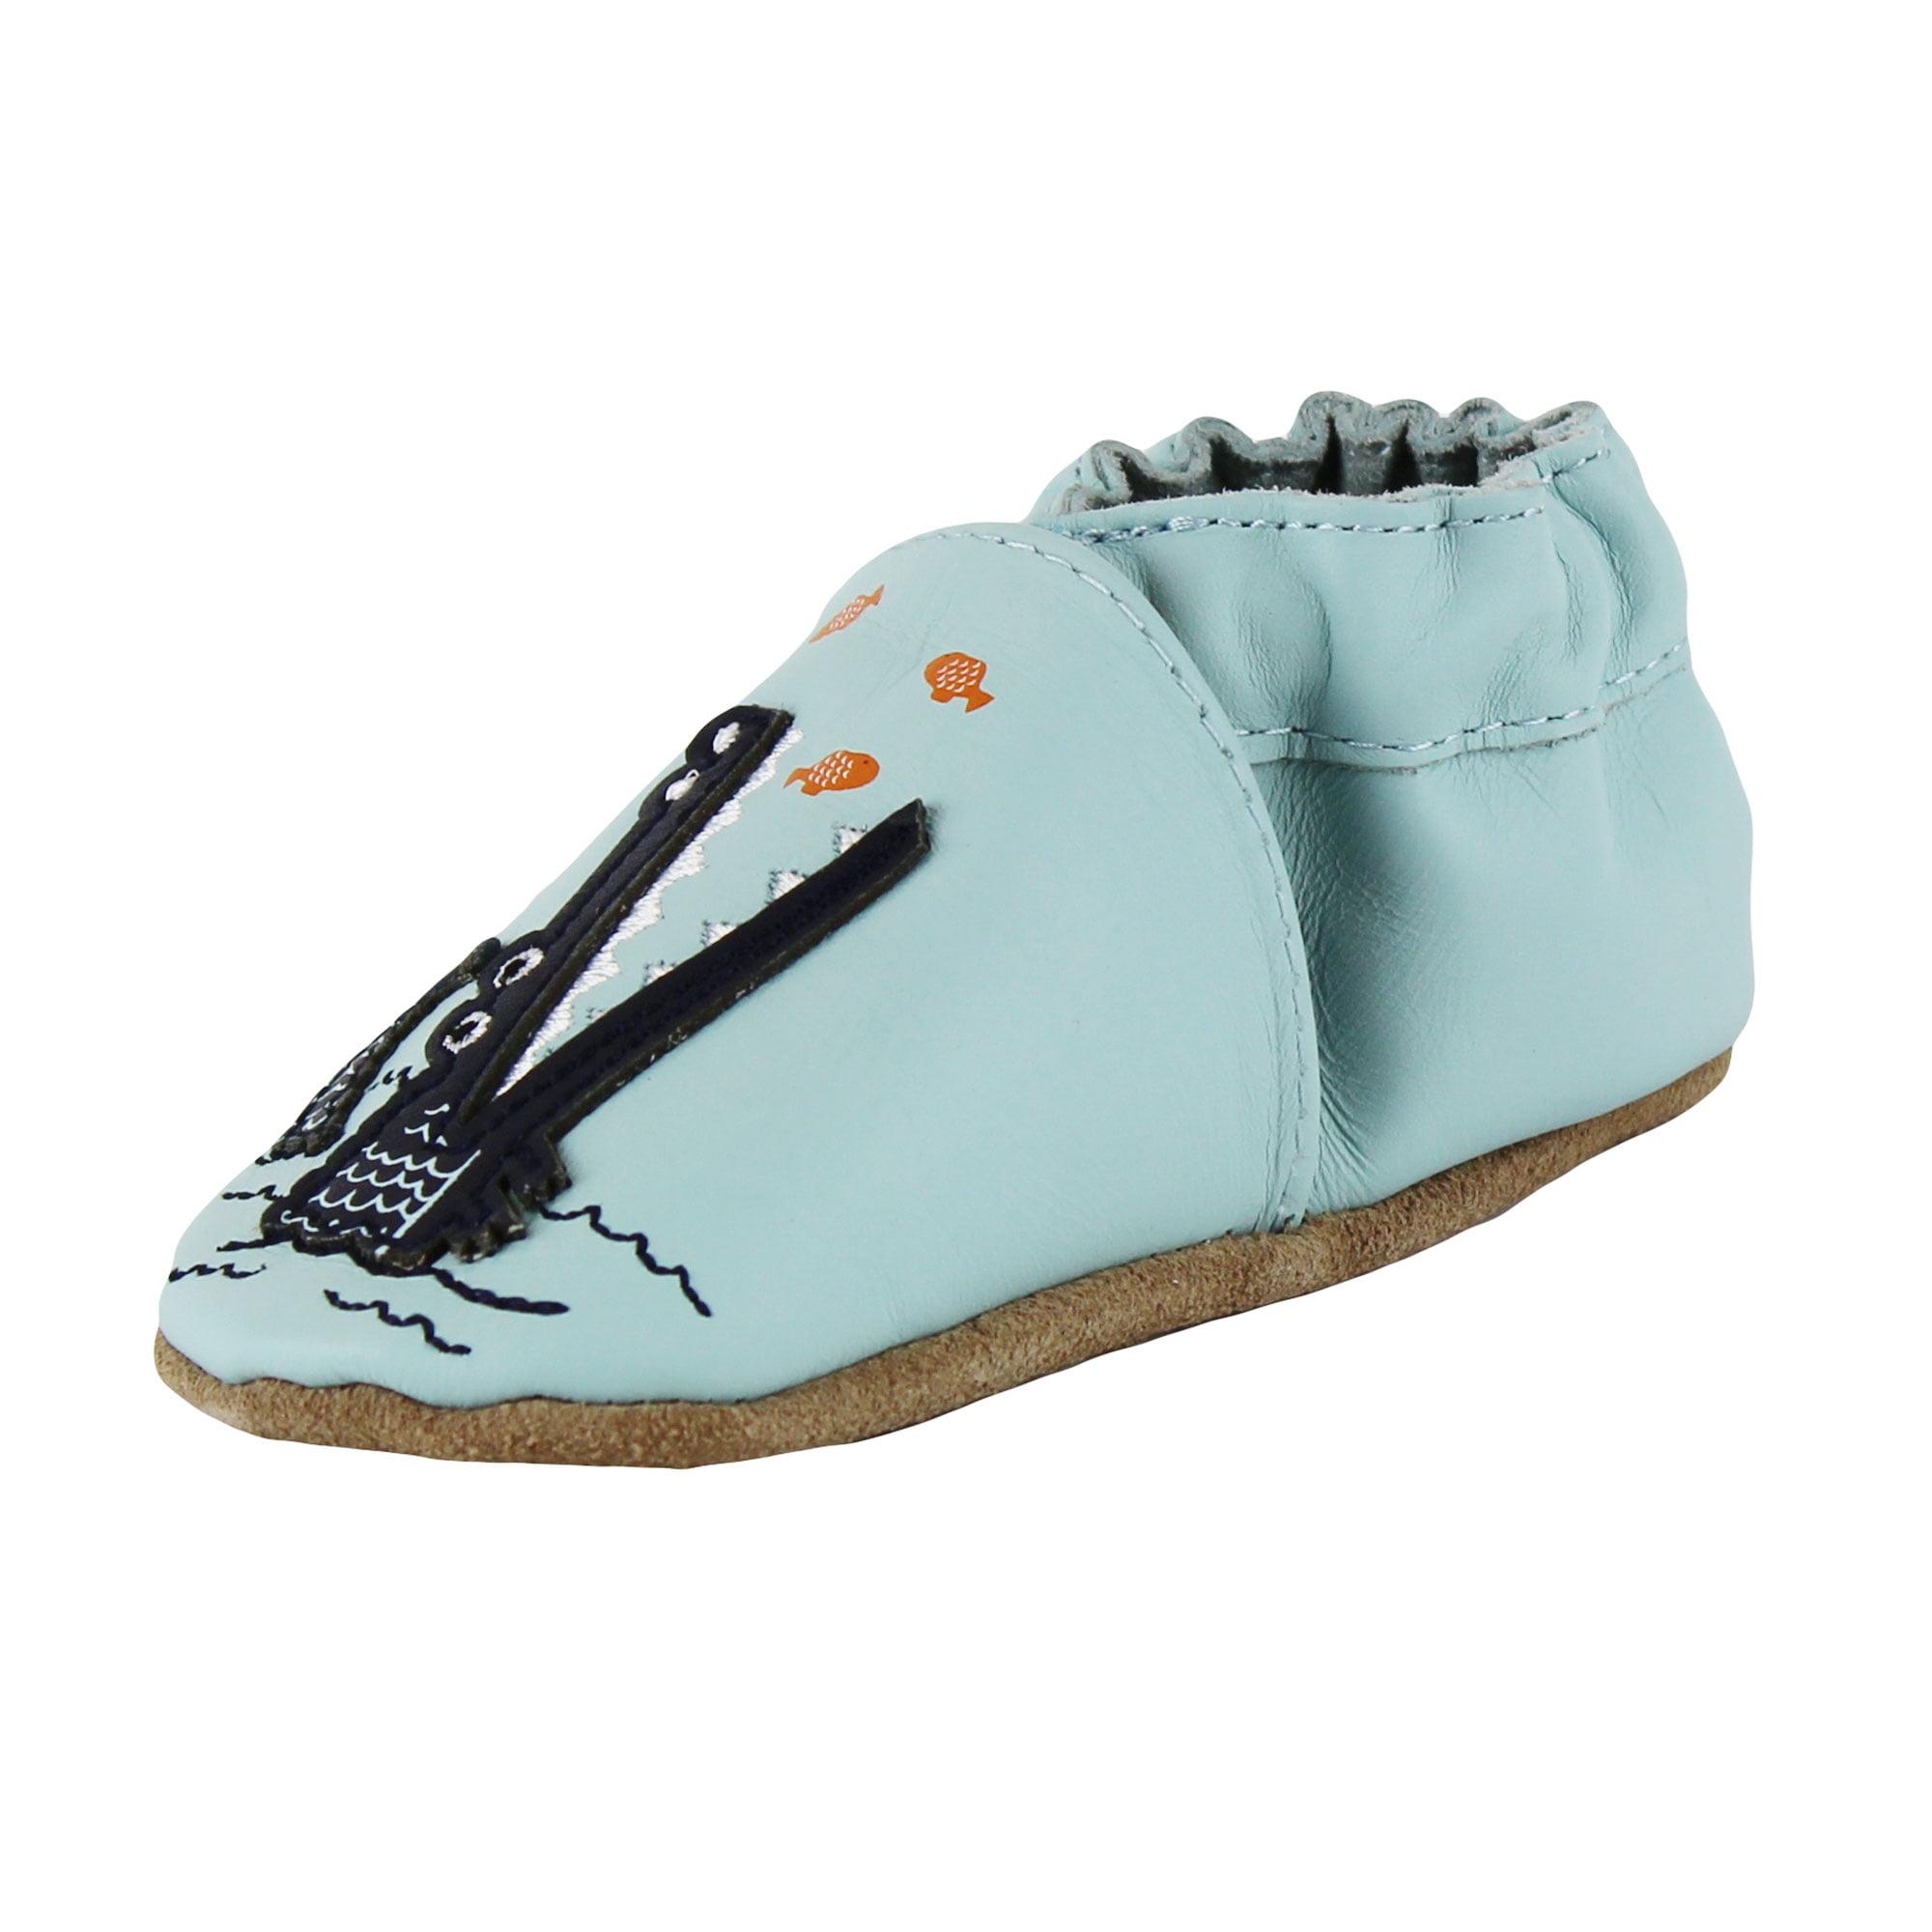 Robeez Baby Boys Alligator Prewalker Leather Baby Shoes Crib Shoes 0